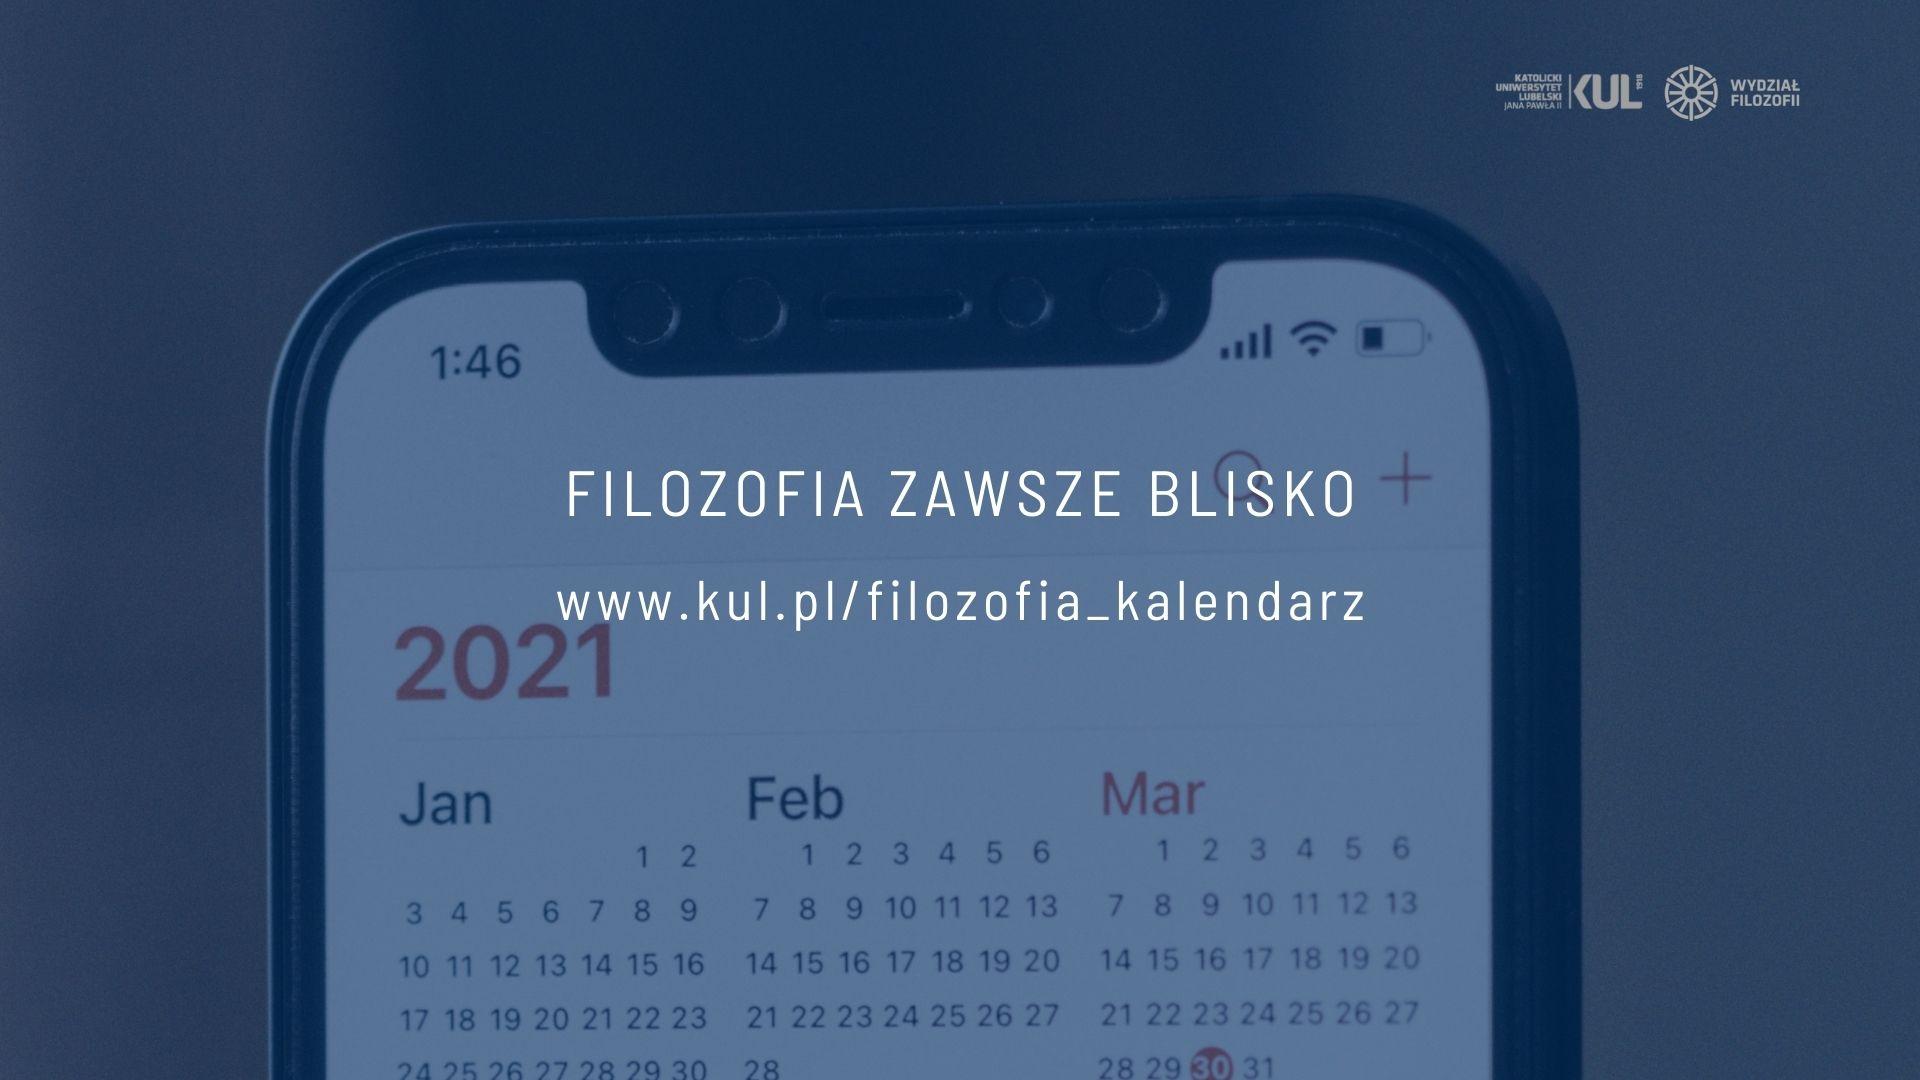 2021 filozofia kalendarz